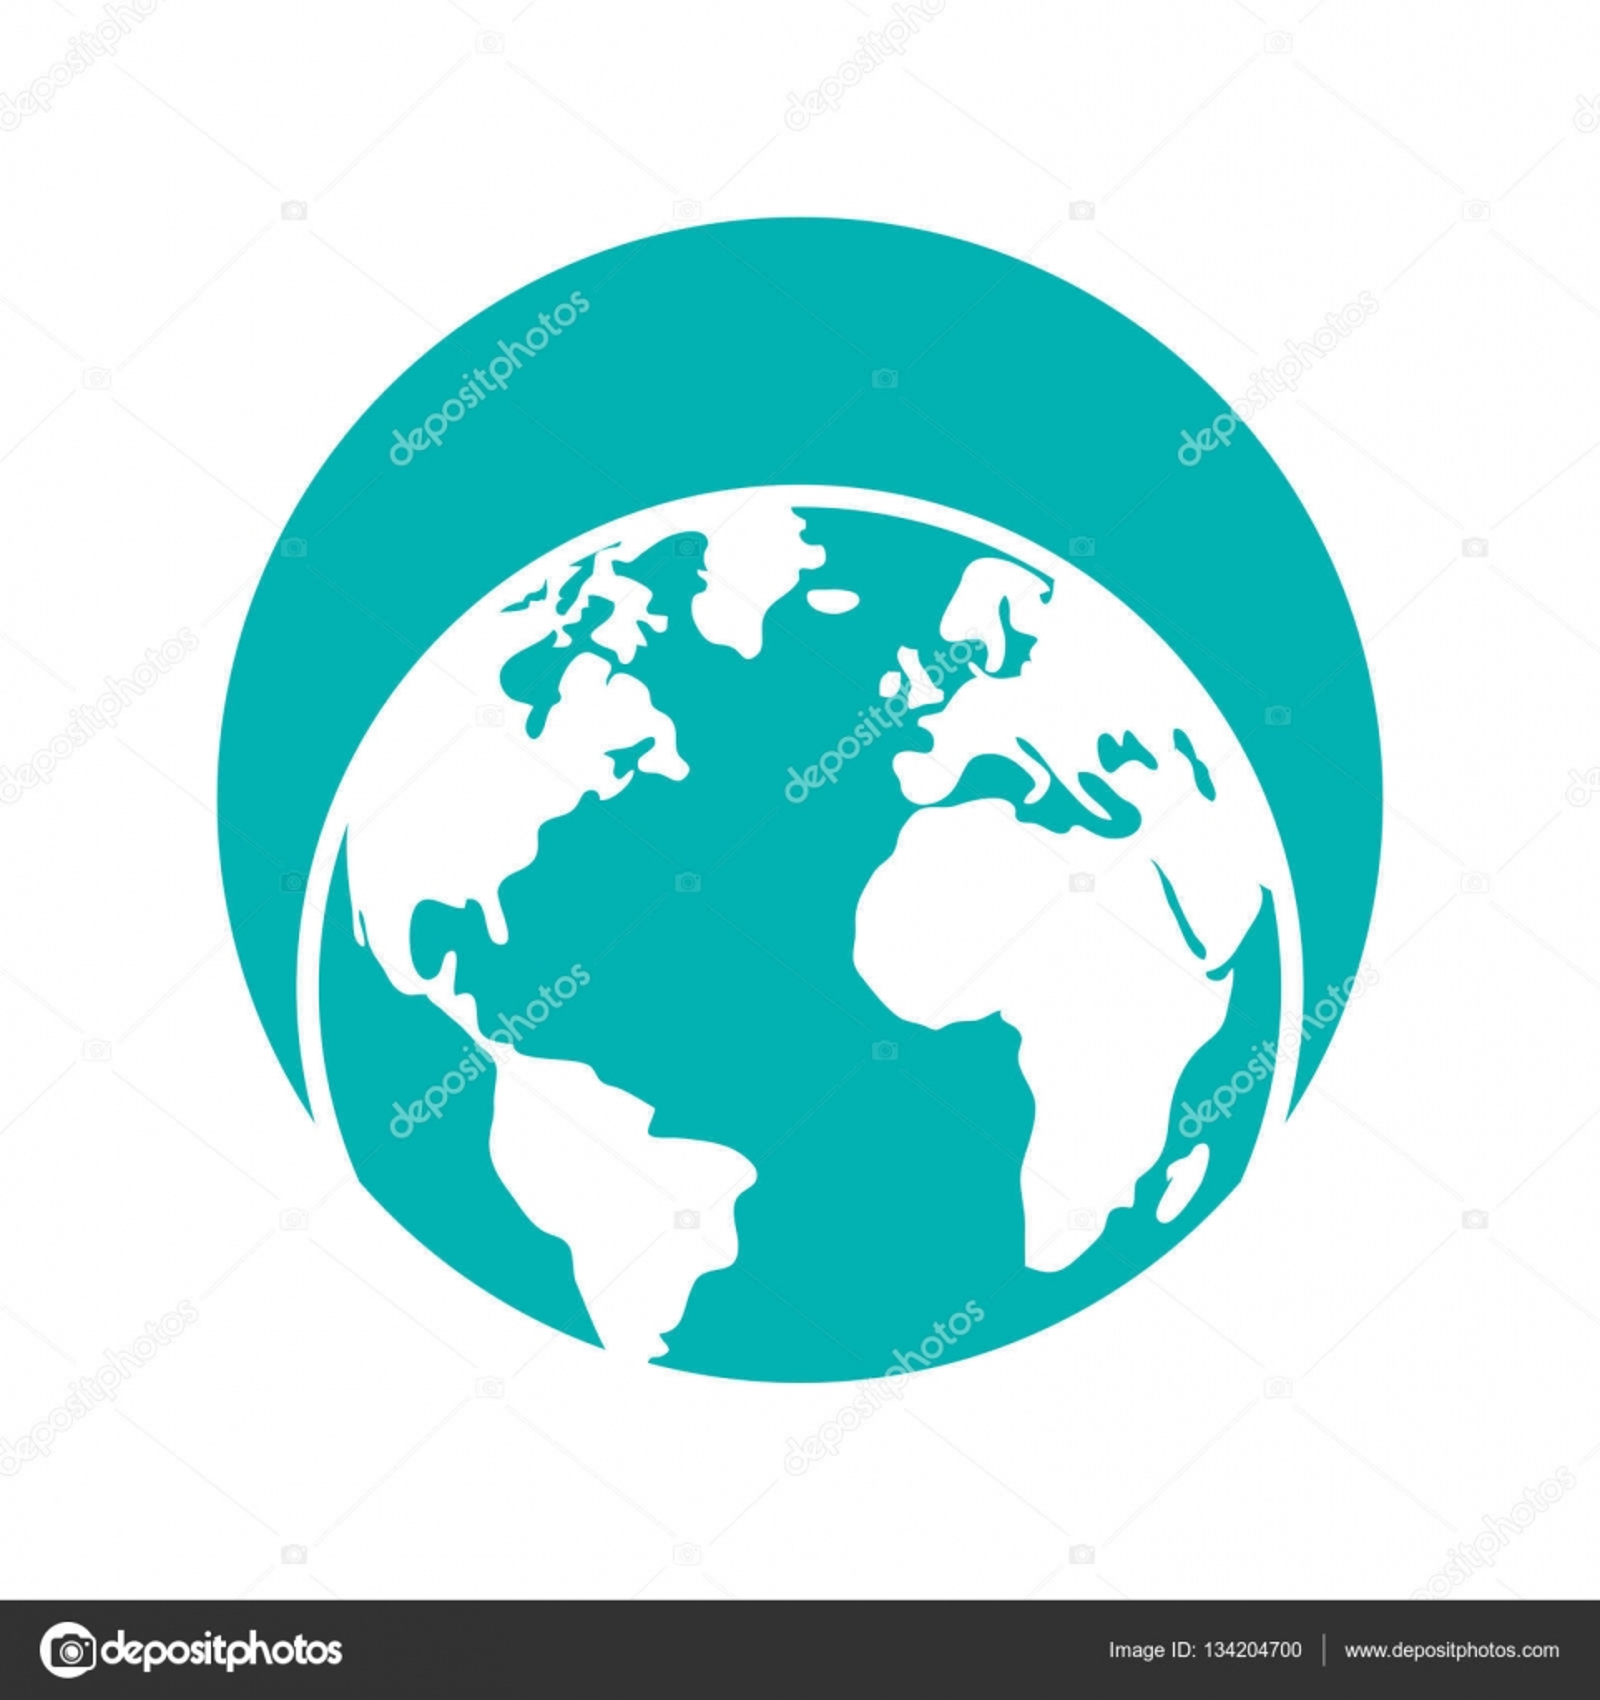 Globus Weltkugel Karte.Globus Weltkugel Erde Karte Stockvektor Djv 134204700